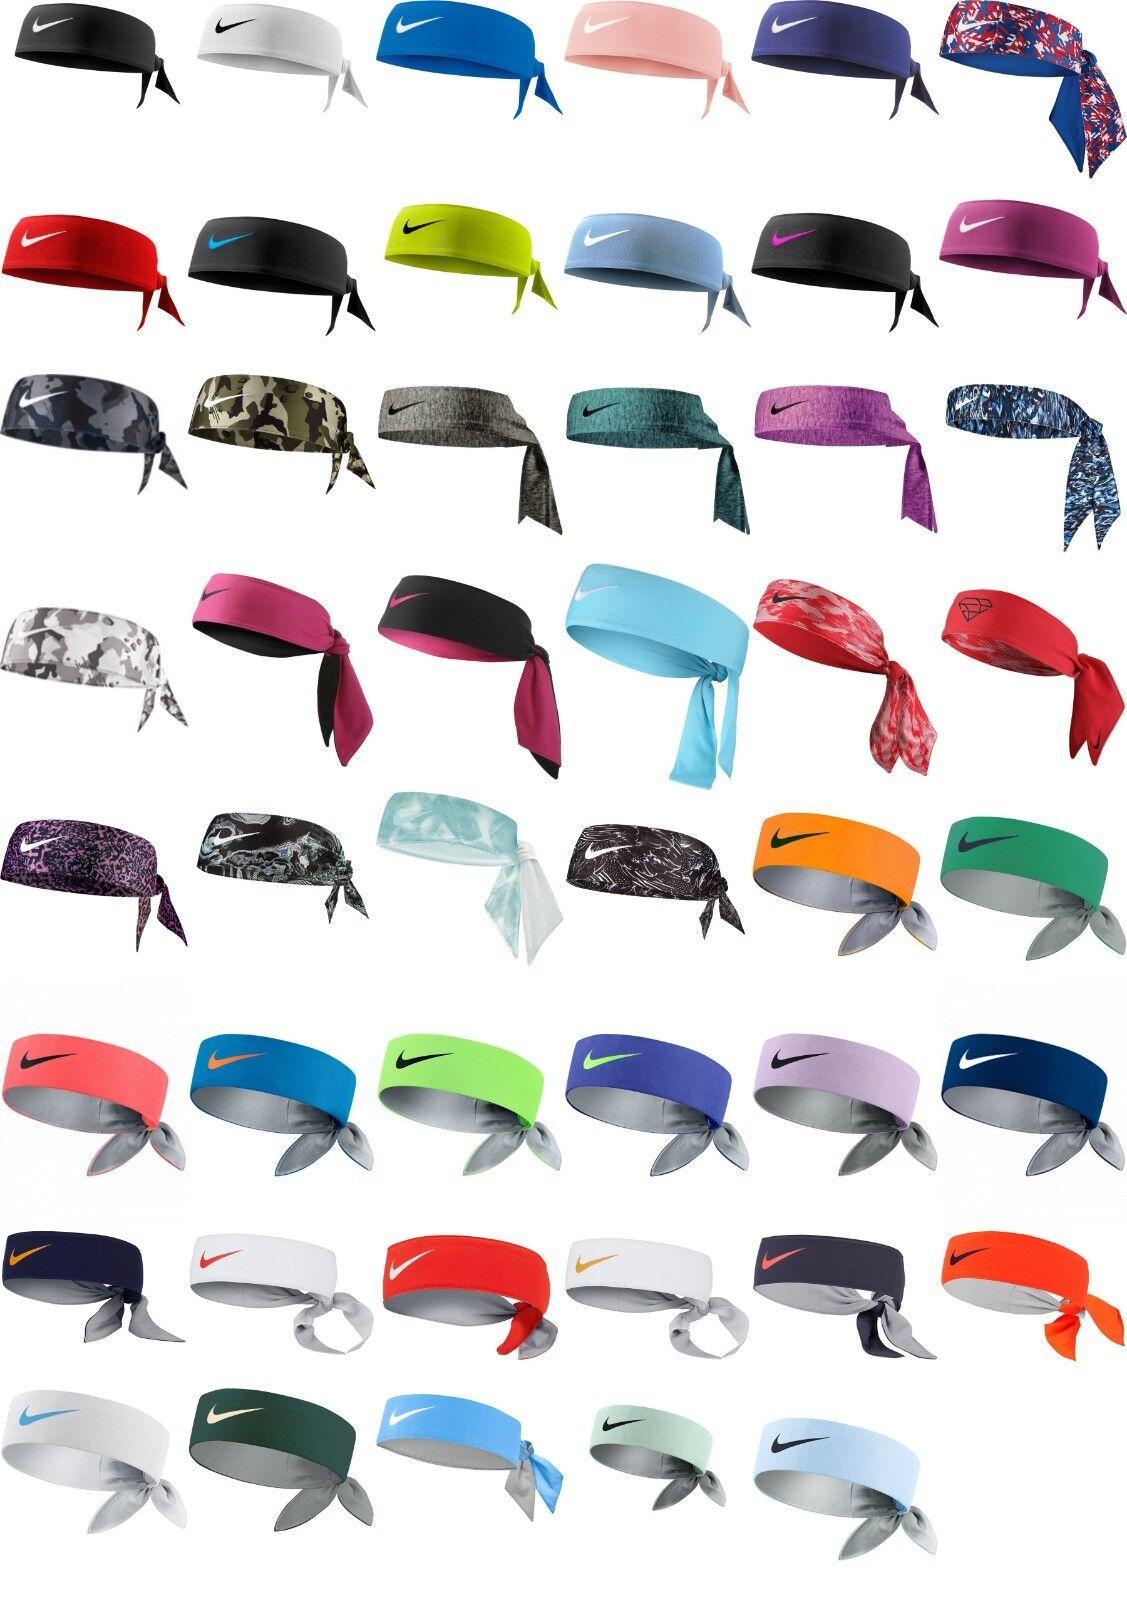 Brand NEW w/Tags Authentic NIKE DRI-FIT Head Tie 2.0 HEADBANDS *Low Price*